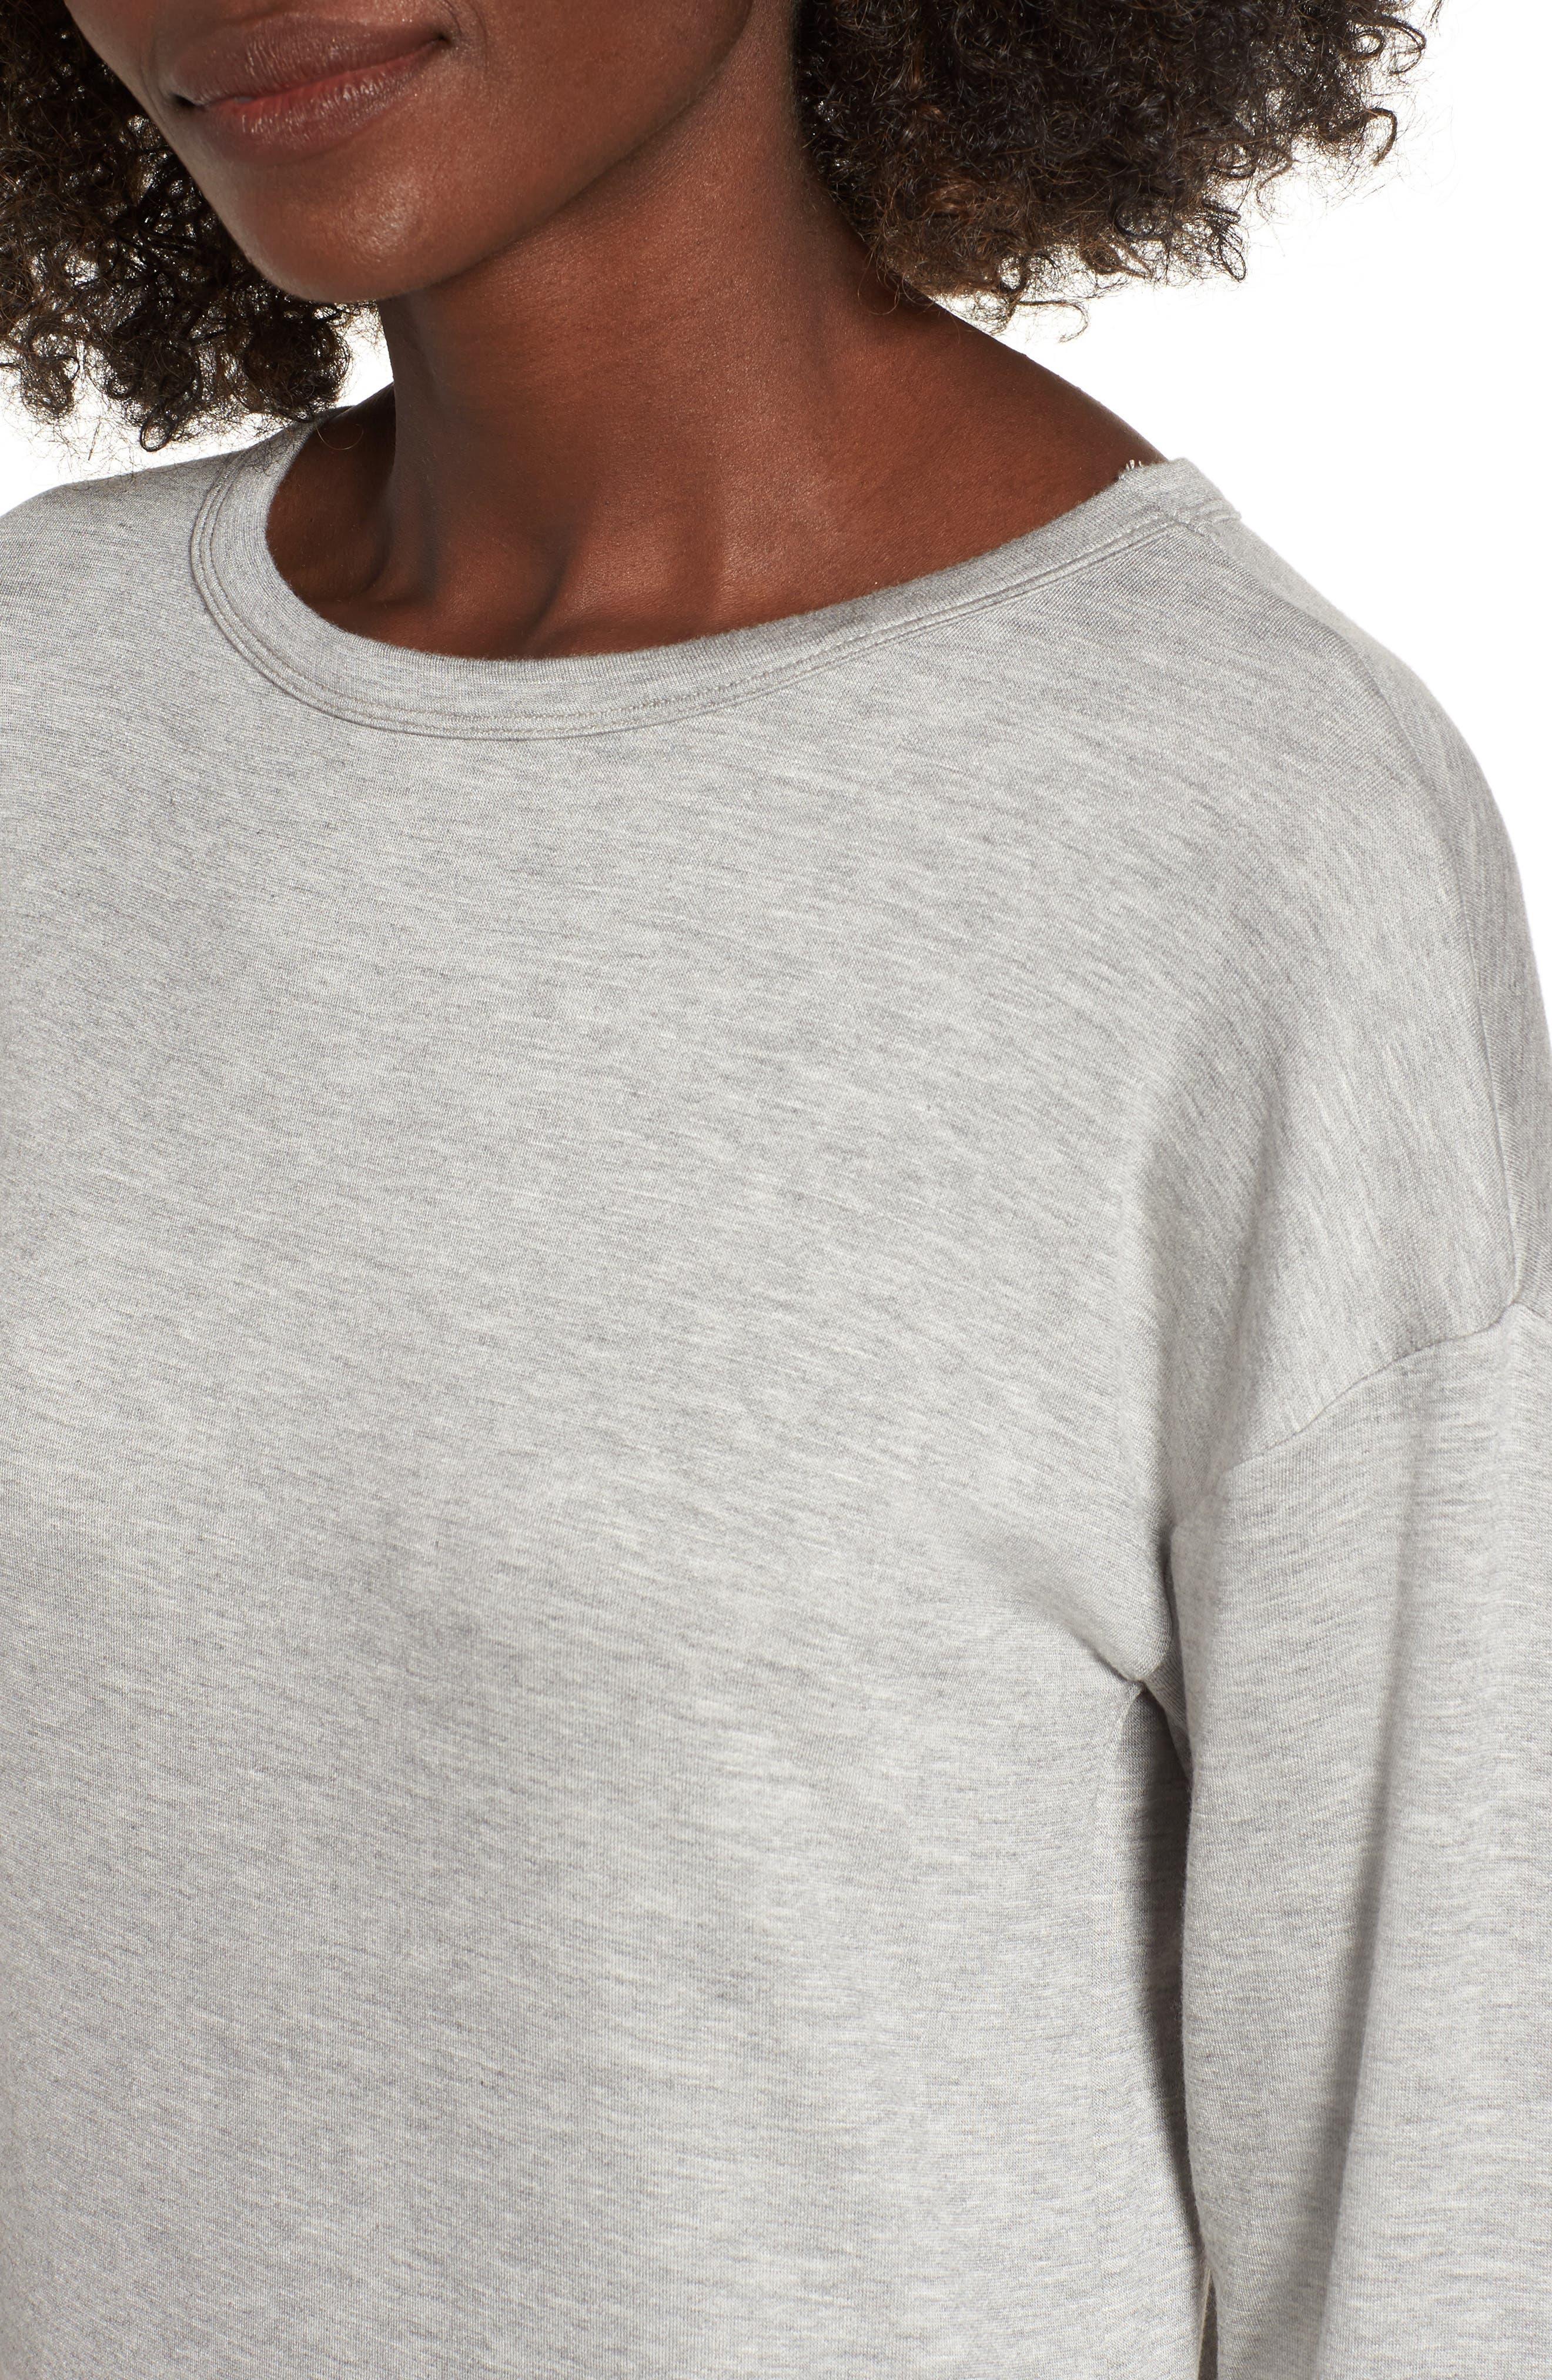 Drop Waist Sweatshirt Dress,                             Alternate thumbnail 4, color,                             Heather Grey